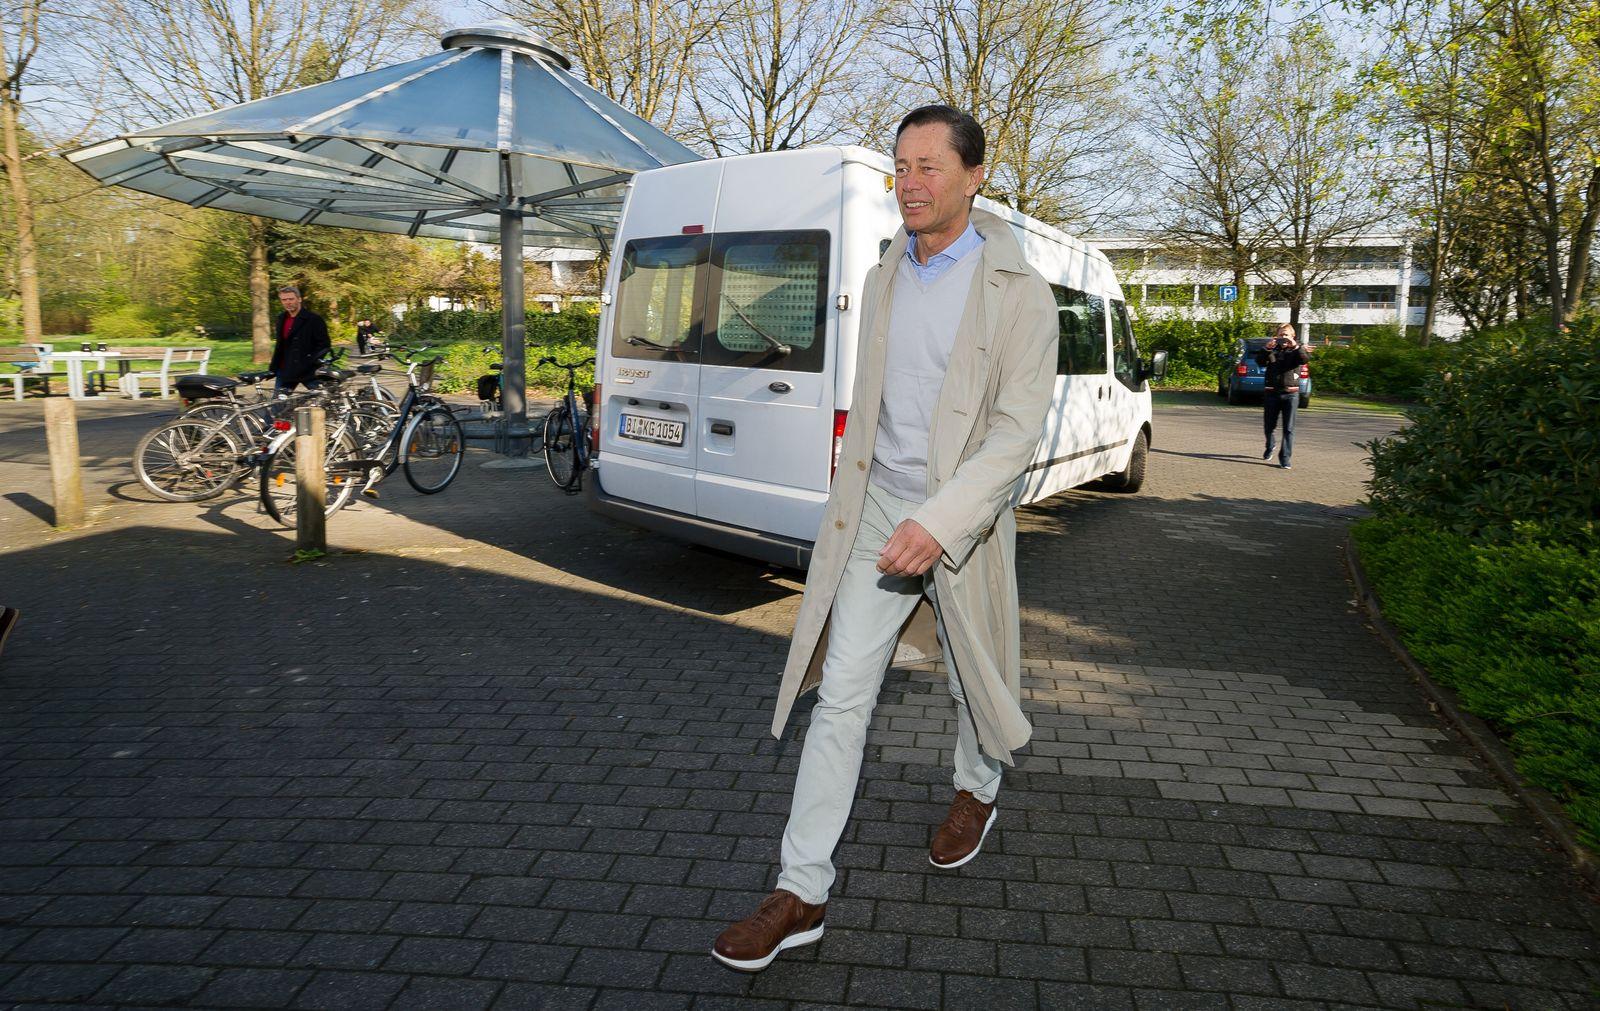 Middelhoff tritt Job in Behindertenwerkstatt an